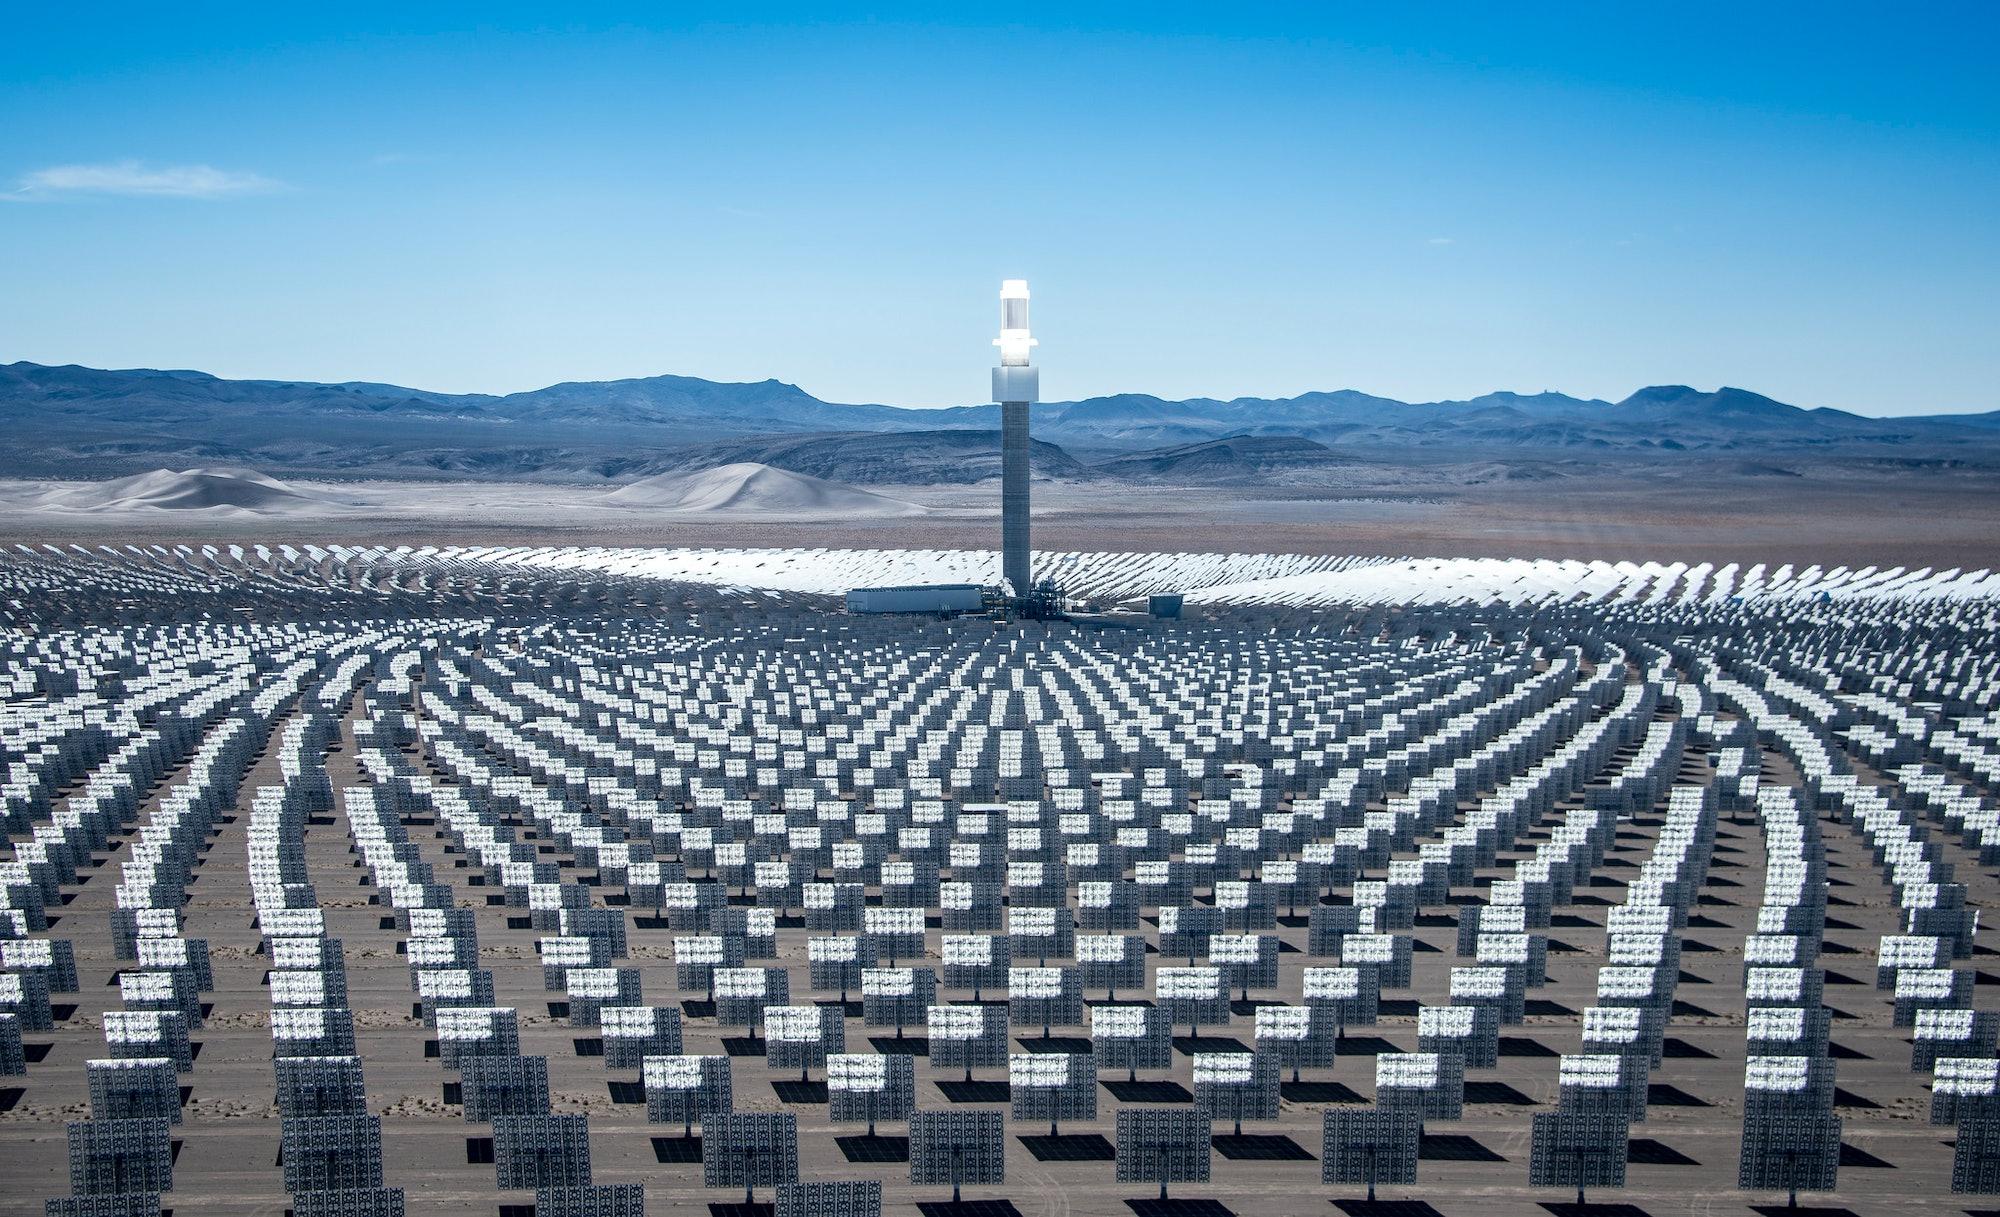 James Redford's new documentary focuses on renewable energy.